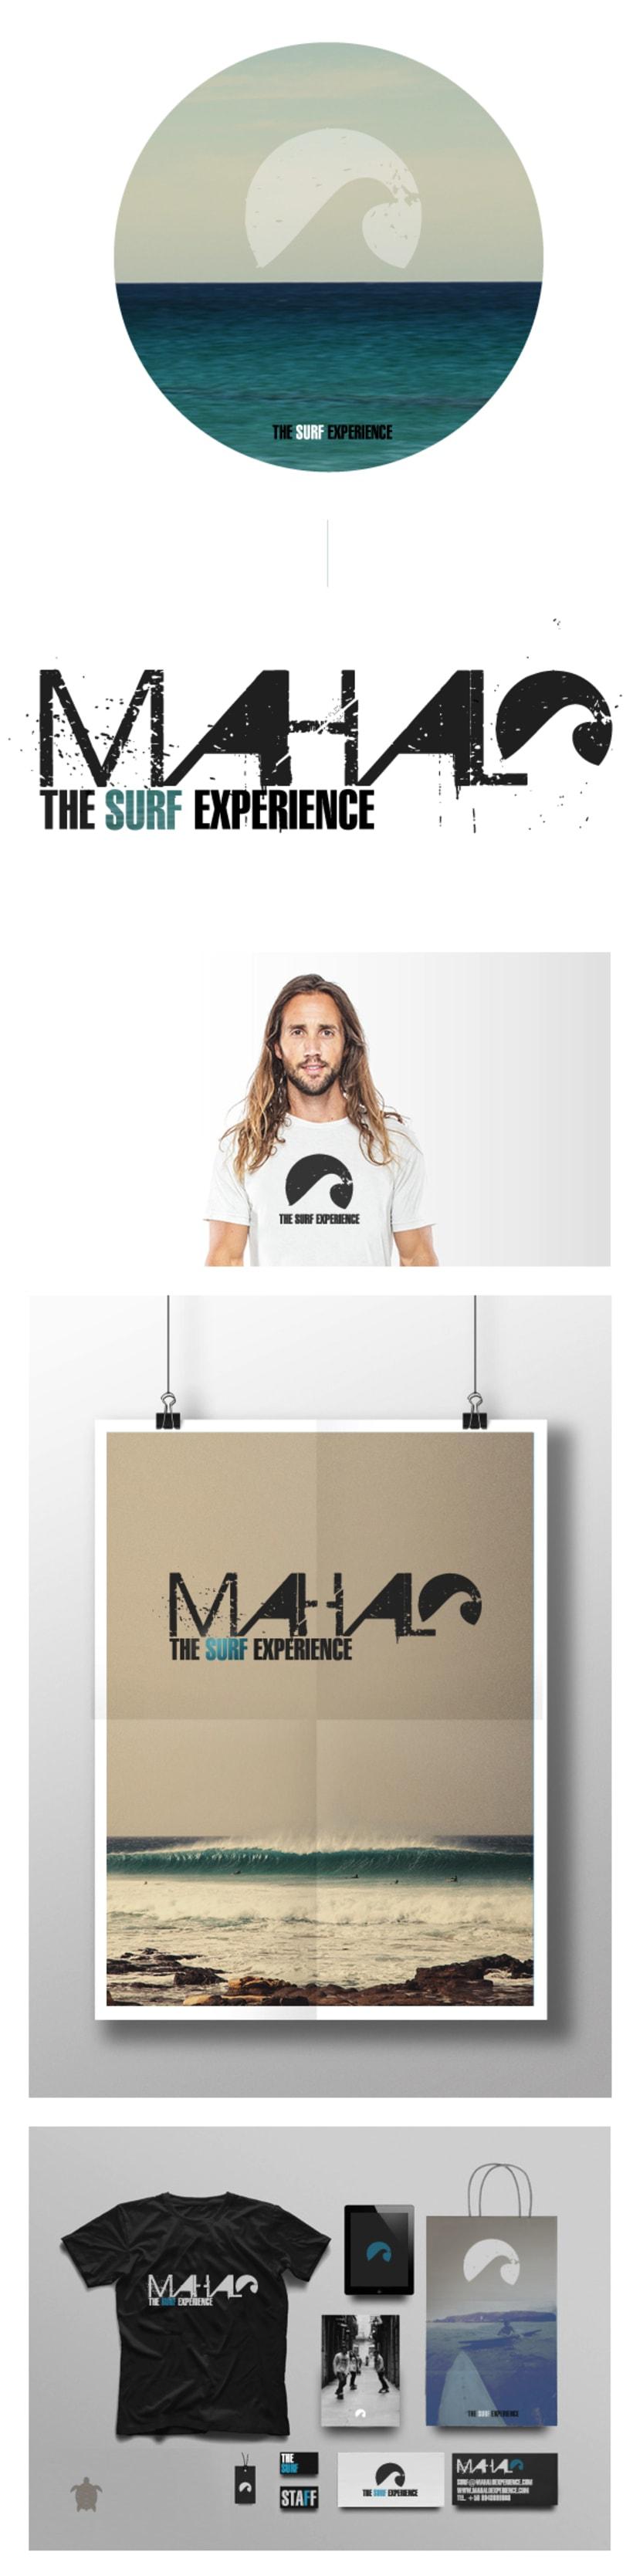 Identidad Corporativa / Branding  0